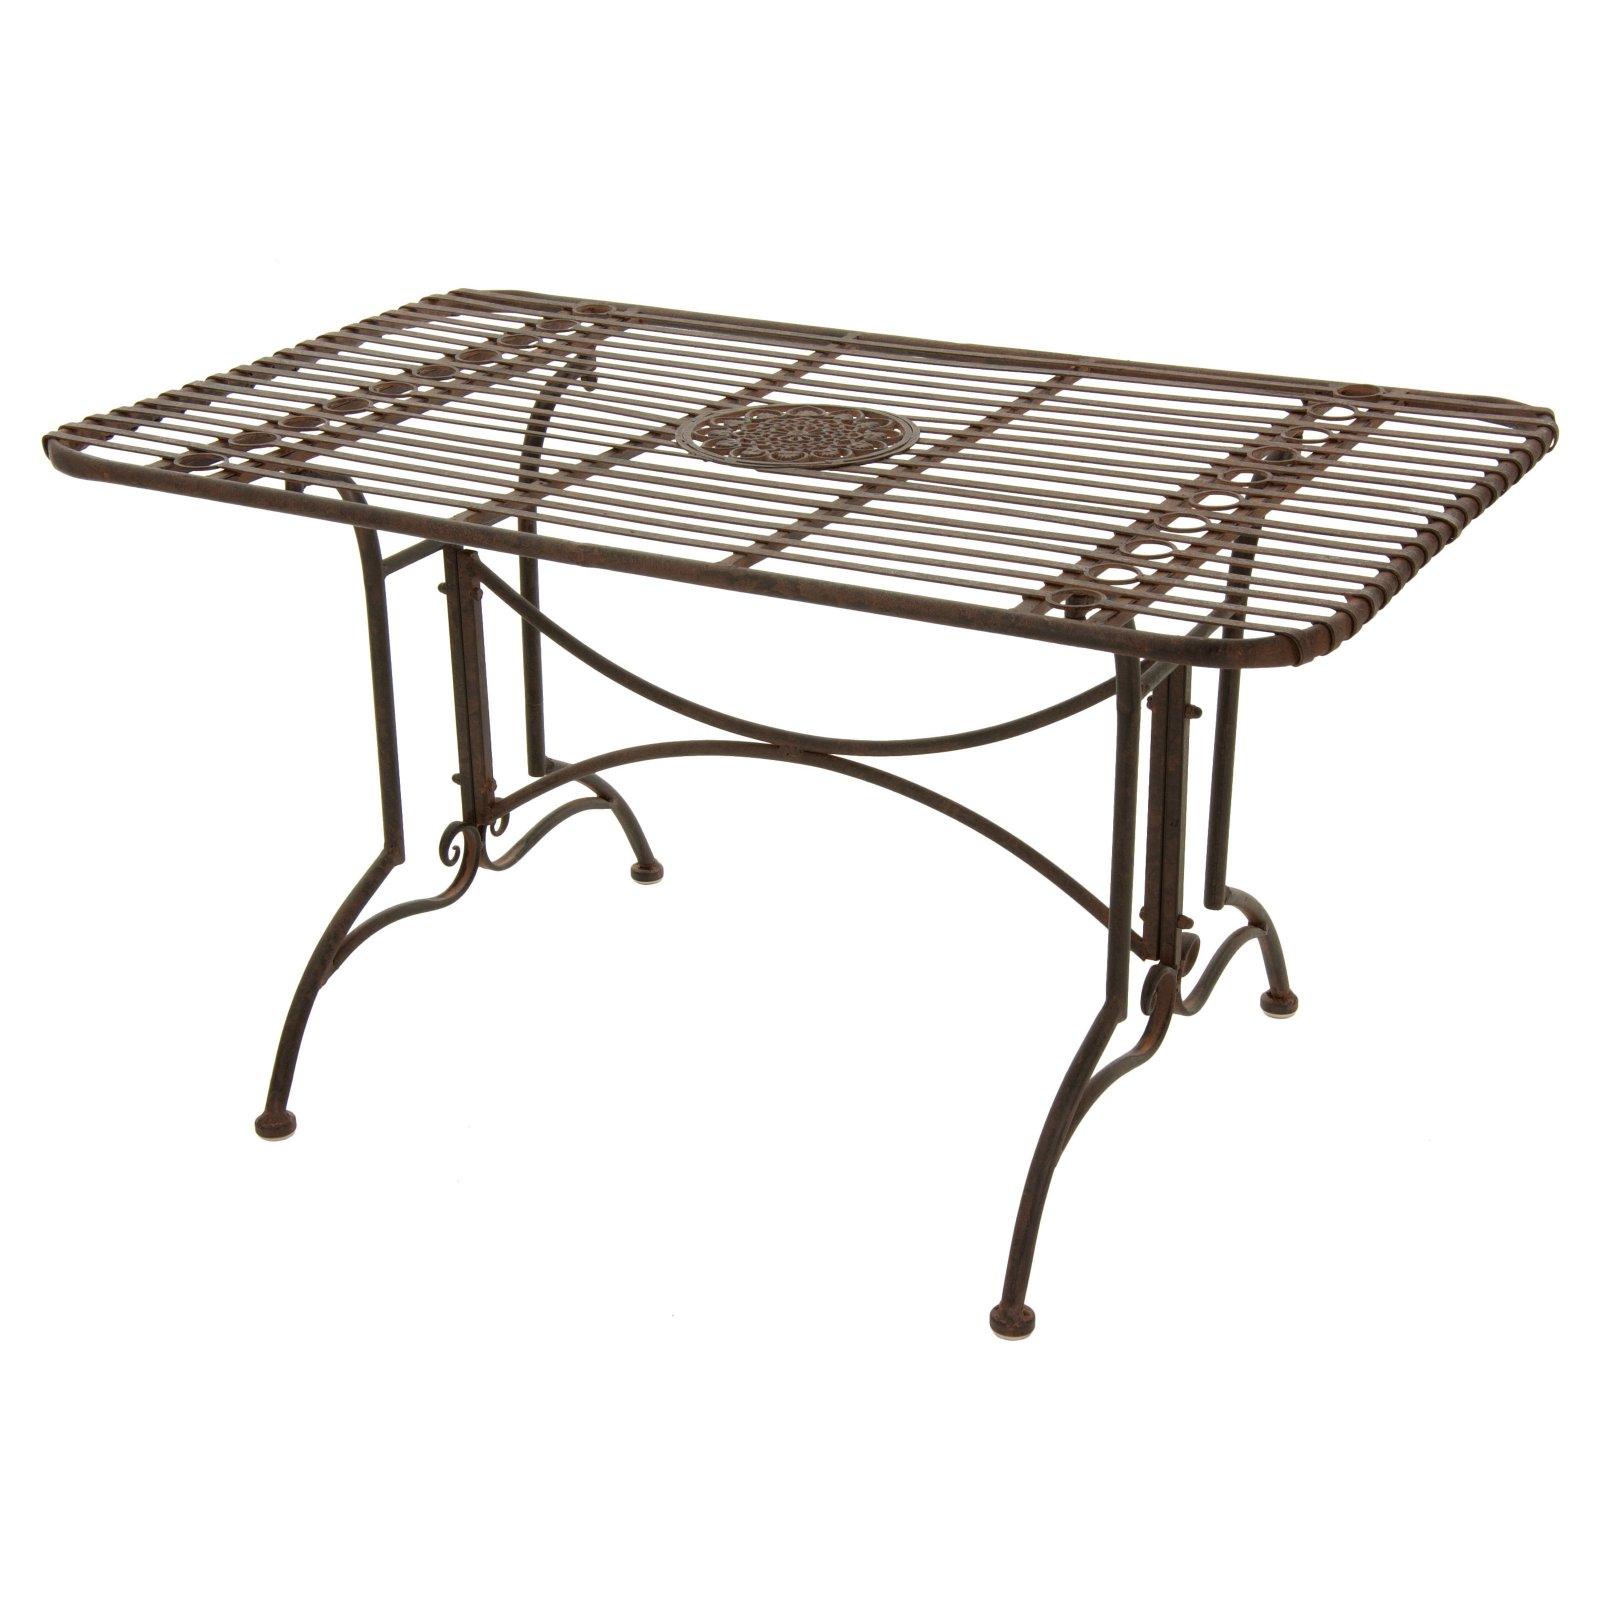 Oriental Furniture Rustic Wrought Iron Rectangular Patio Dining Table